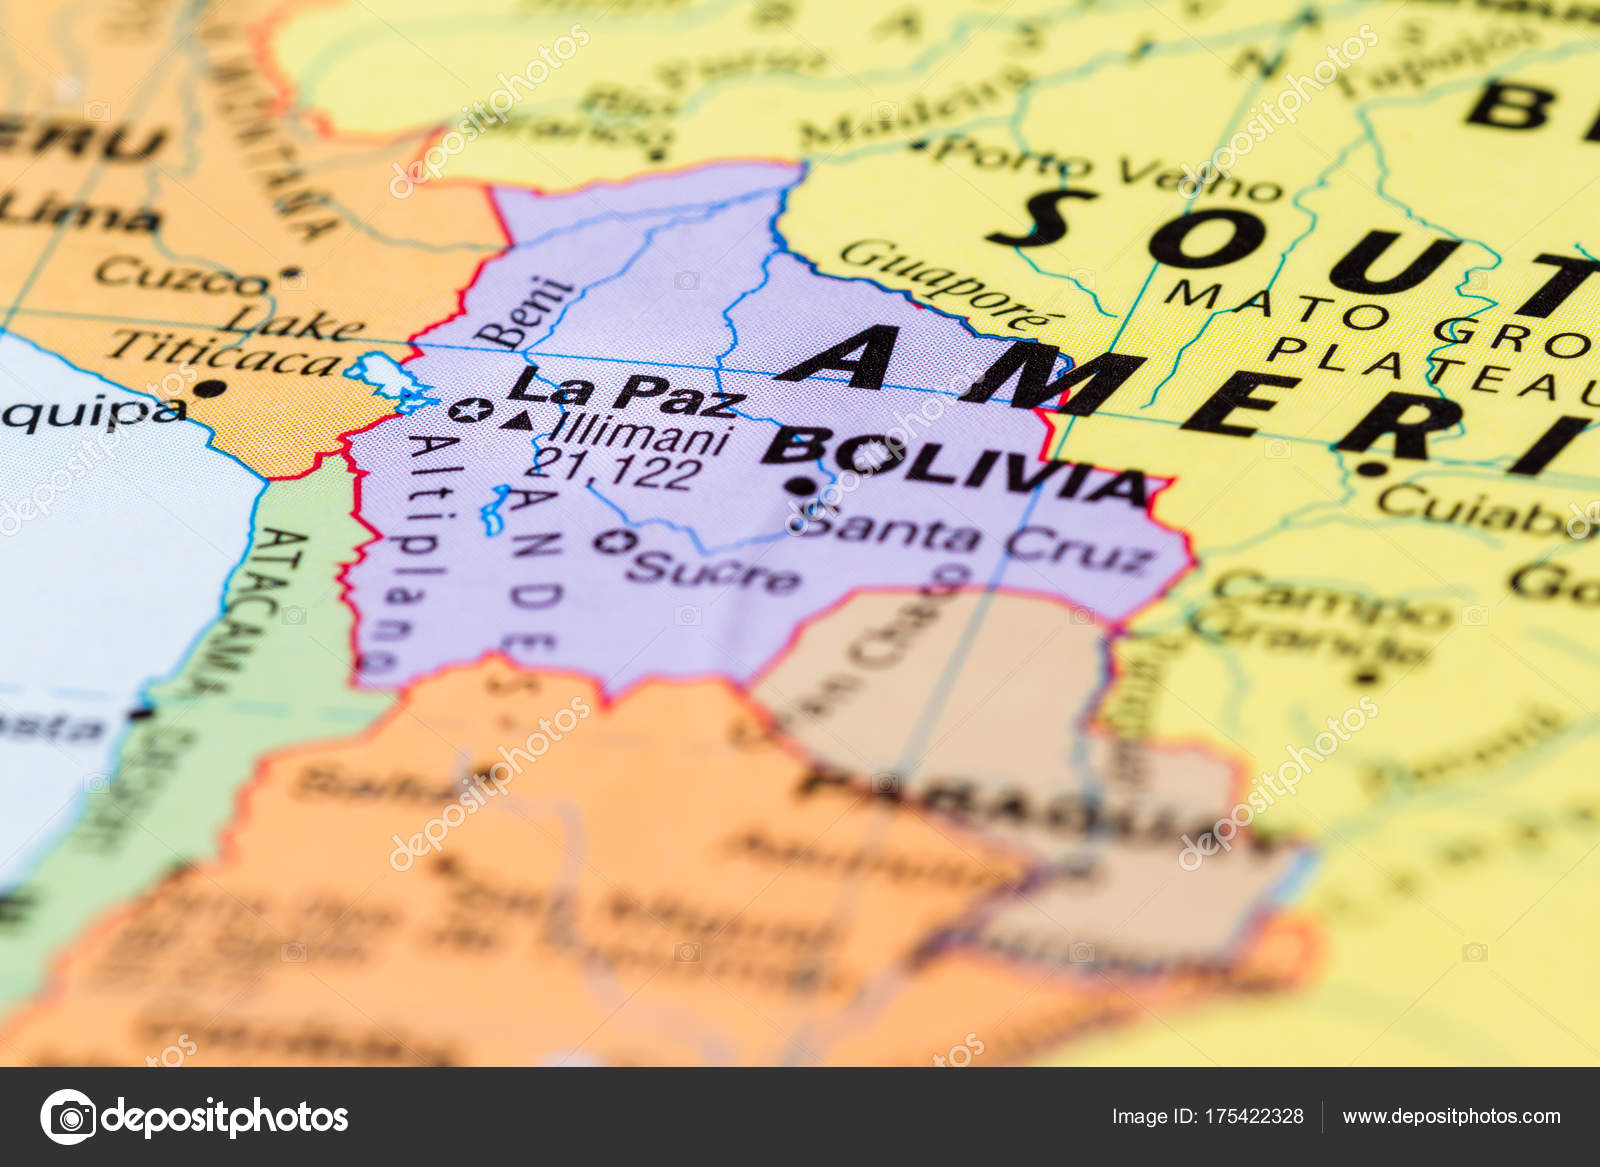 La Paz, Bolivia on a map — Stock Photo © wollertz #175422328 Map La Paz on rio de janeiro map, baja california map, lima map, todos santos map, santiago map, bogota map, south america map, peru map, bolivia map, los angeles map, montevideo map, quito map, são paulo map, cabo san lucas map, luanda map, cancun map, costa rica map, sea of cortez map, managua on map, mexico map,